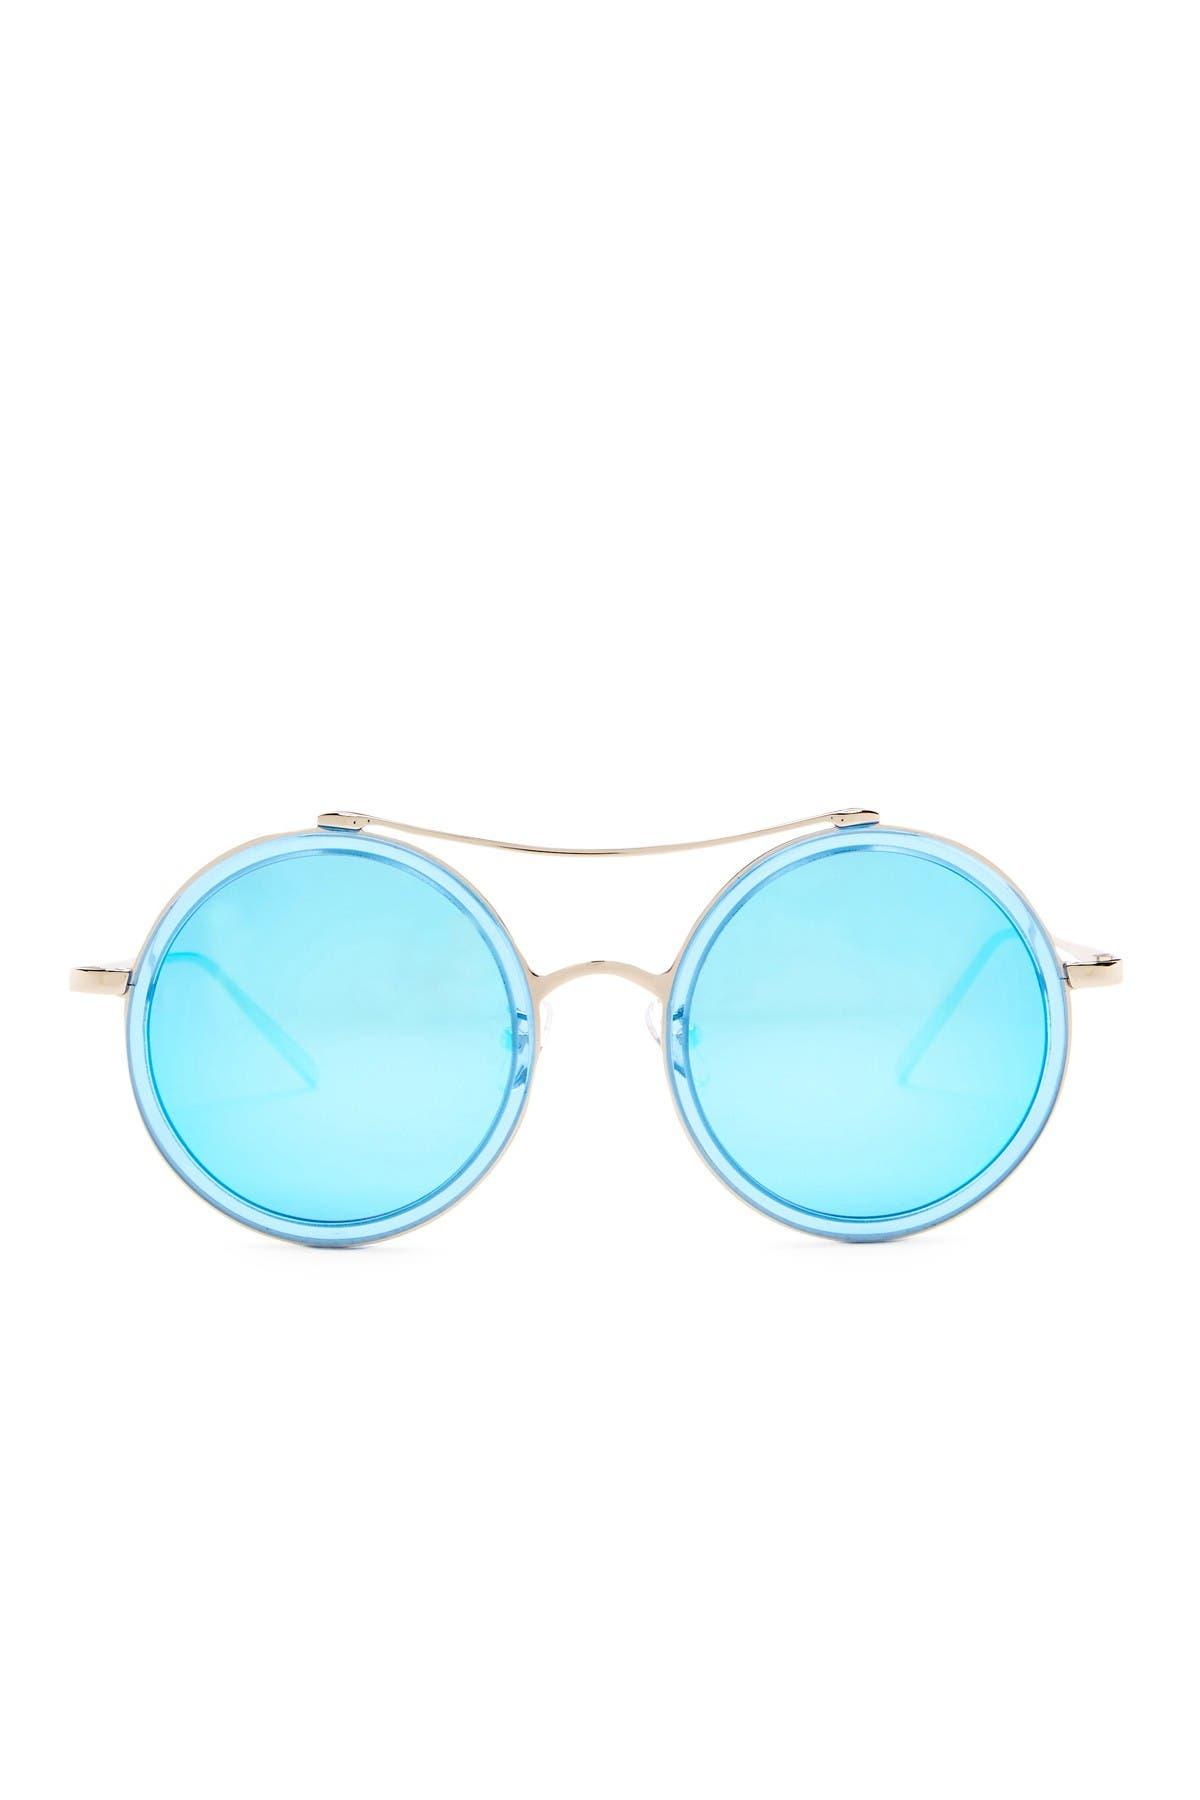 Image of AQS XO 50mm Round Browbridge Sunglasses